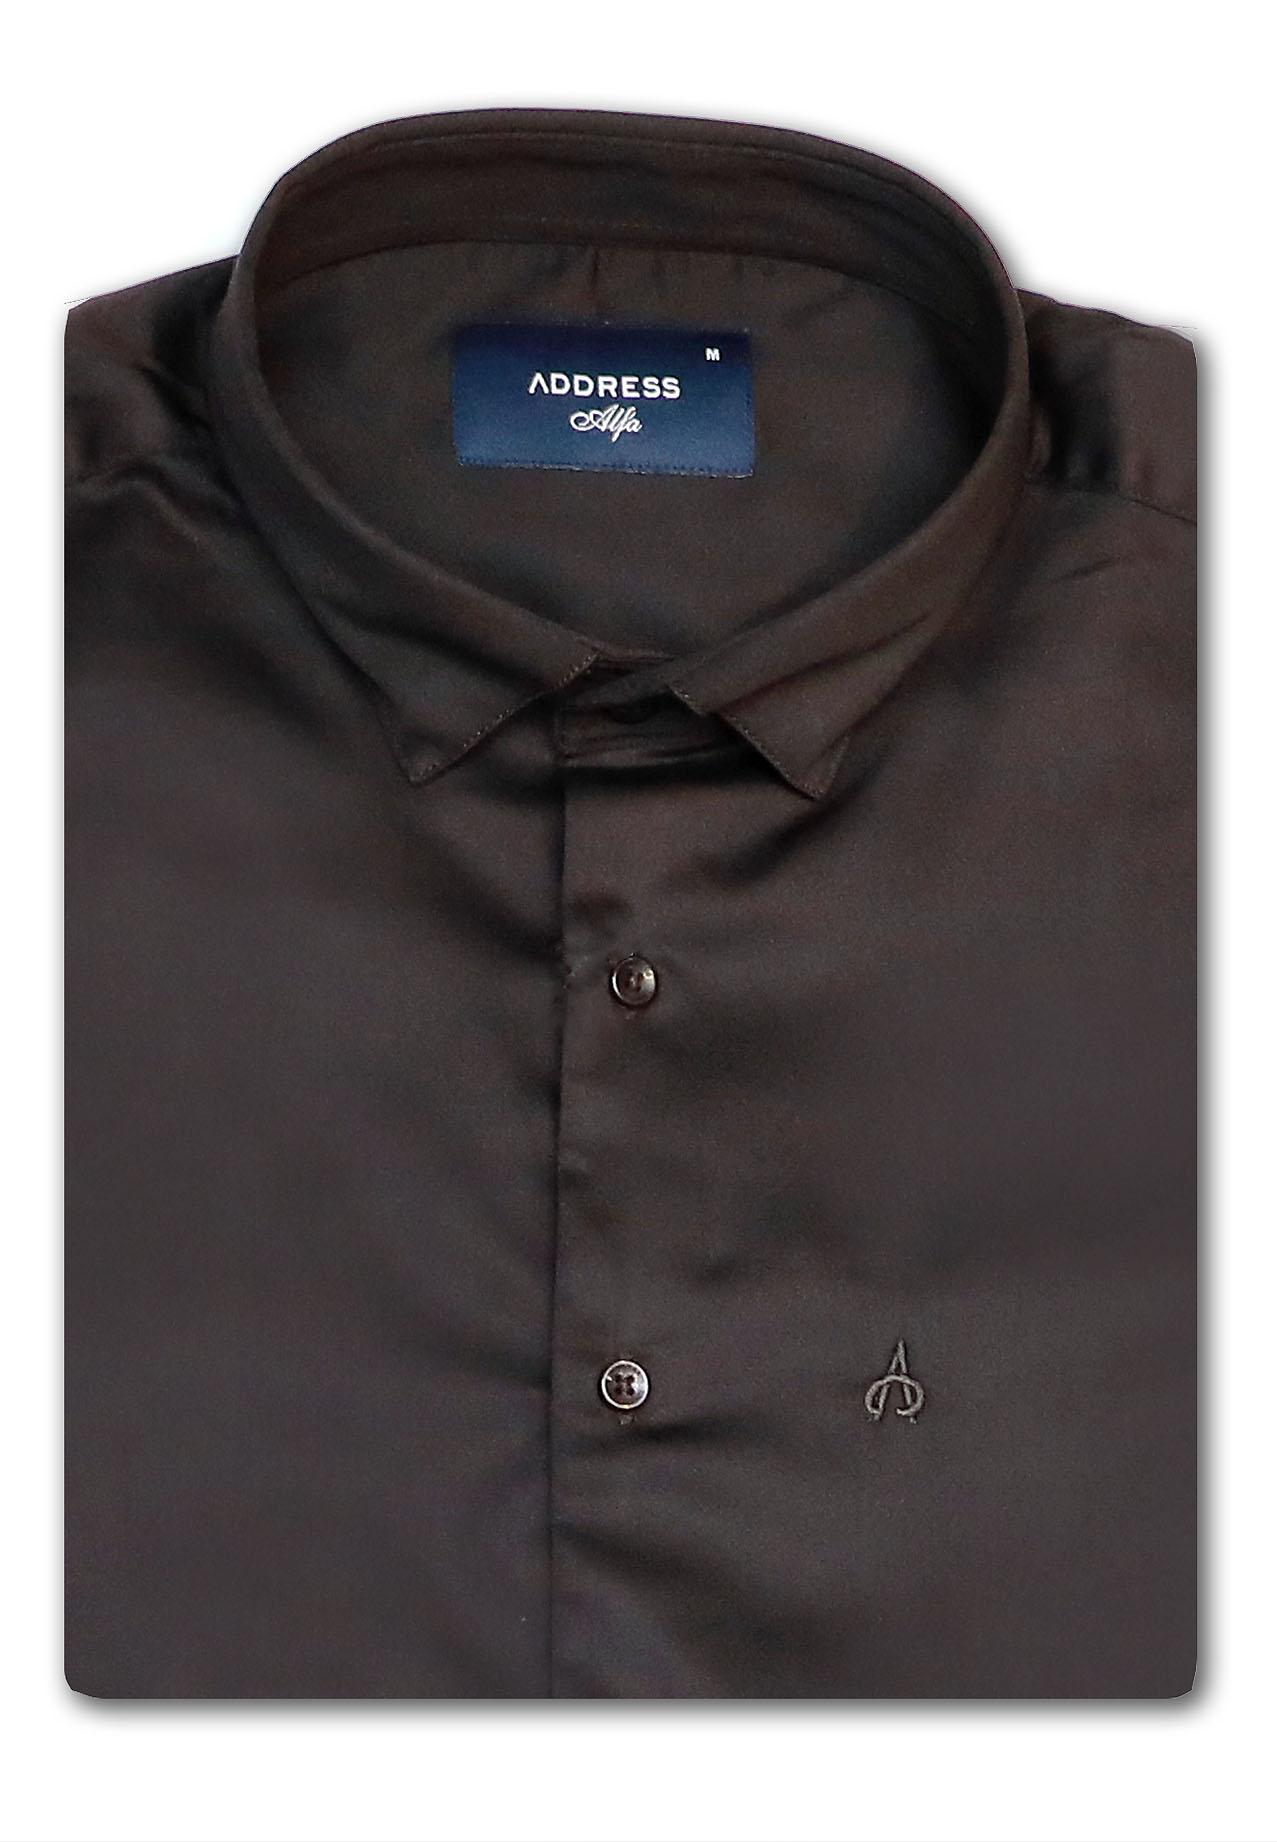 Address Formals Shirt Black, Large